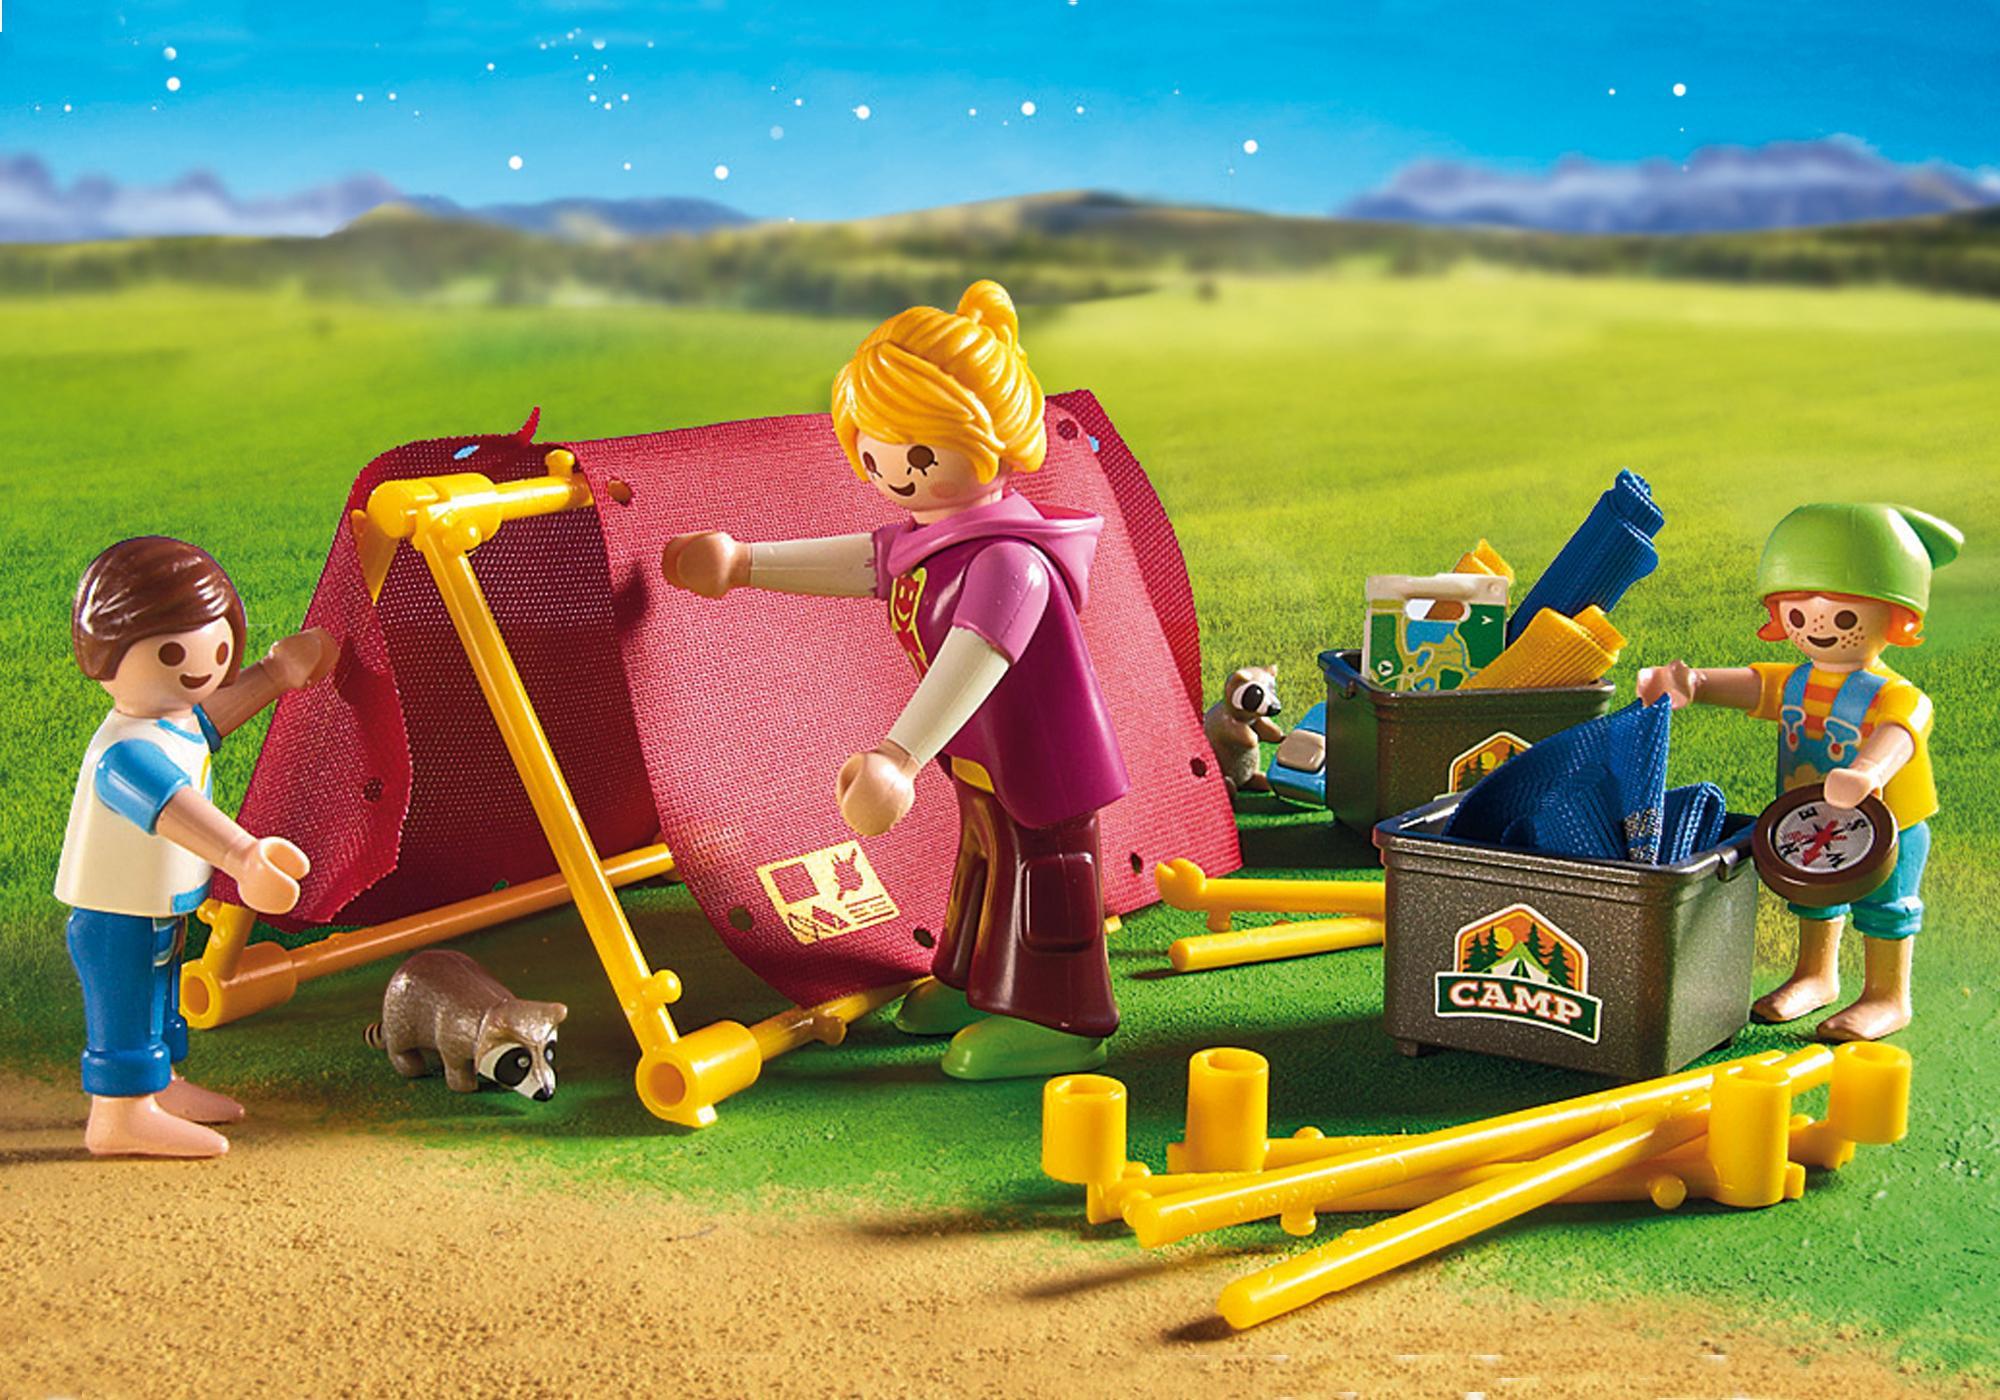 http://media.playmobil.com/i/playmobil/9153_product_extra2